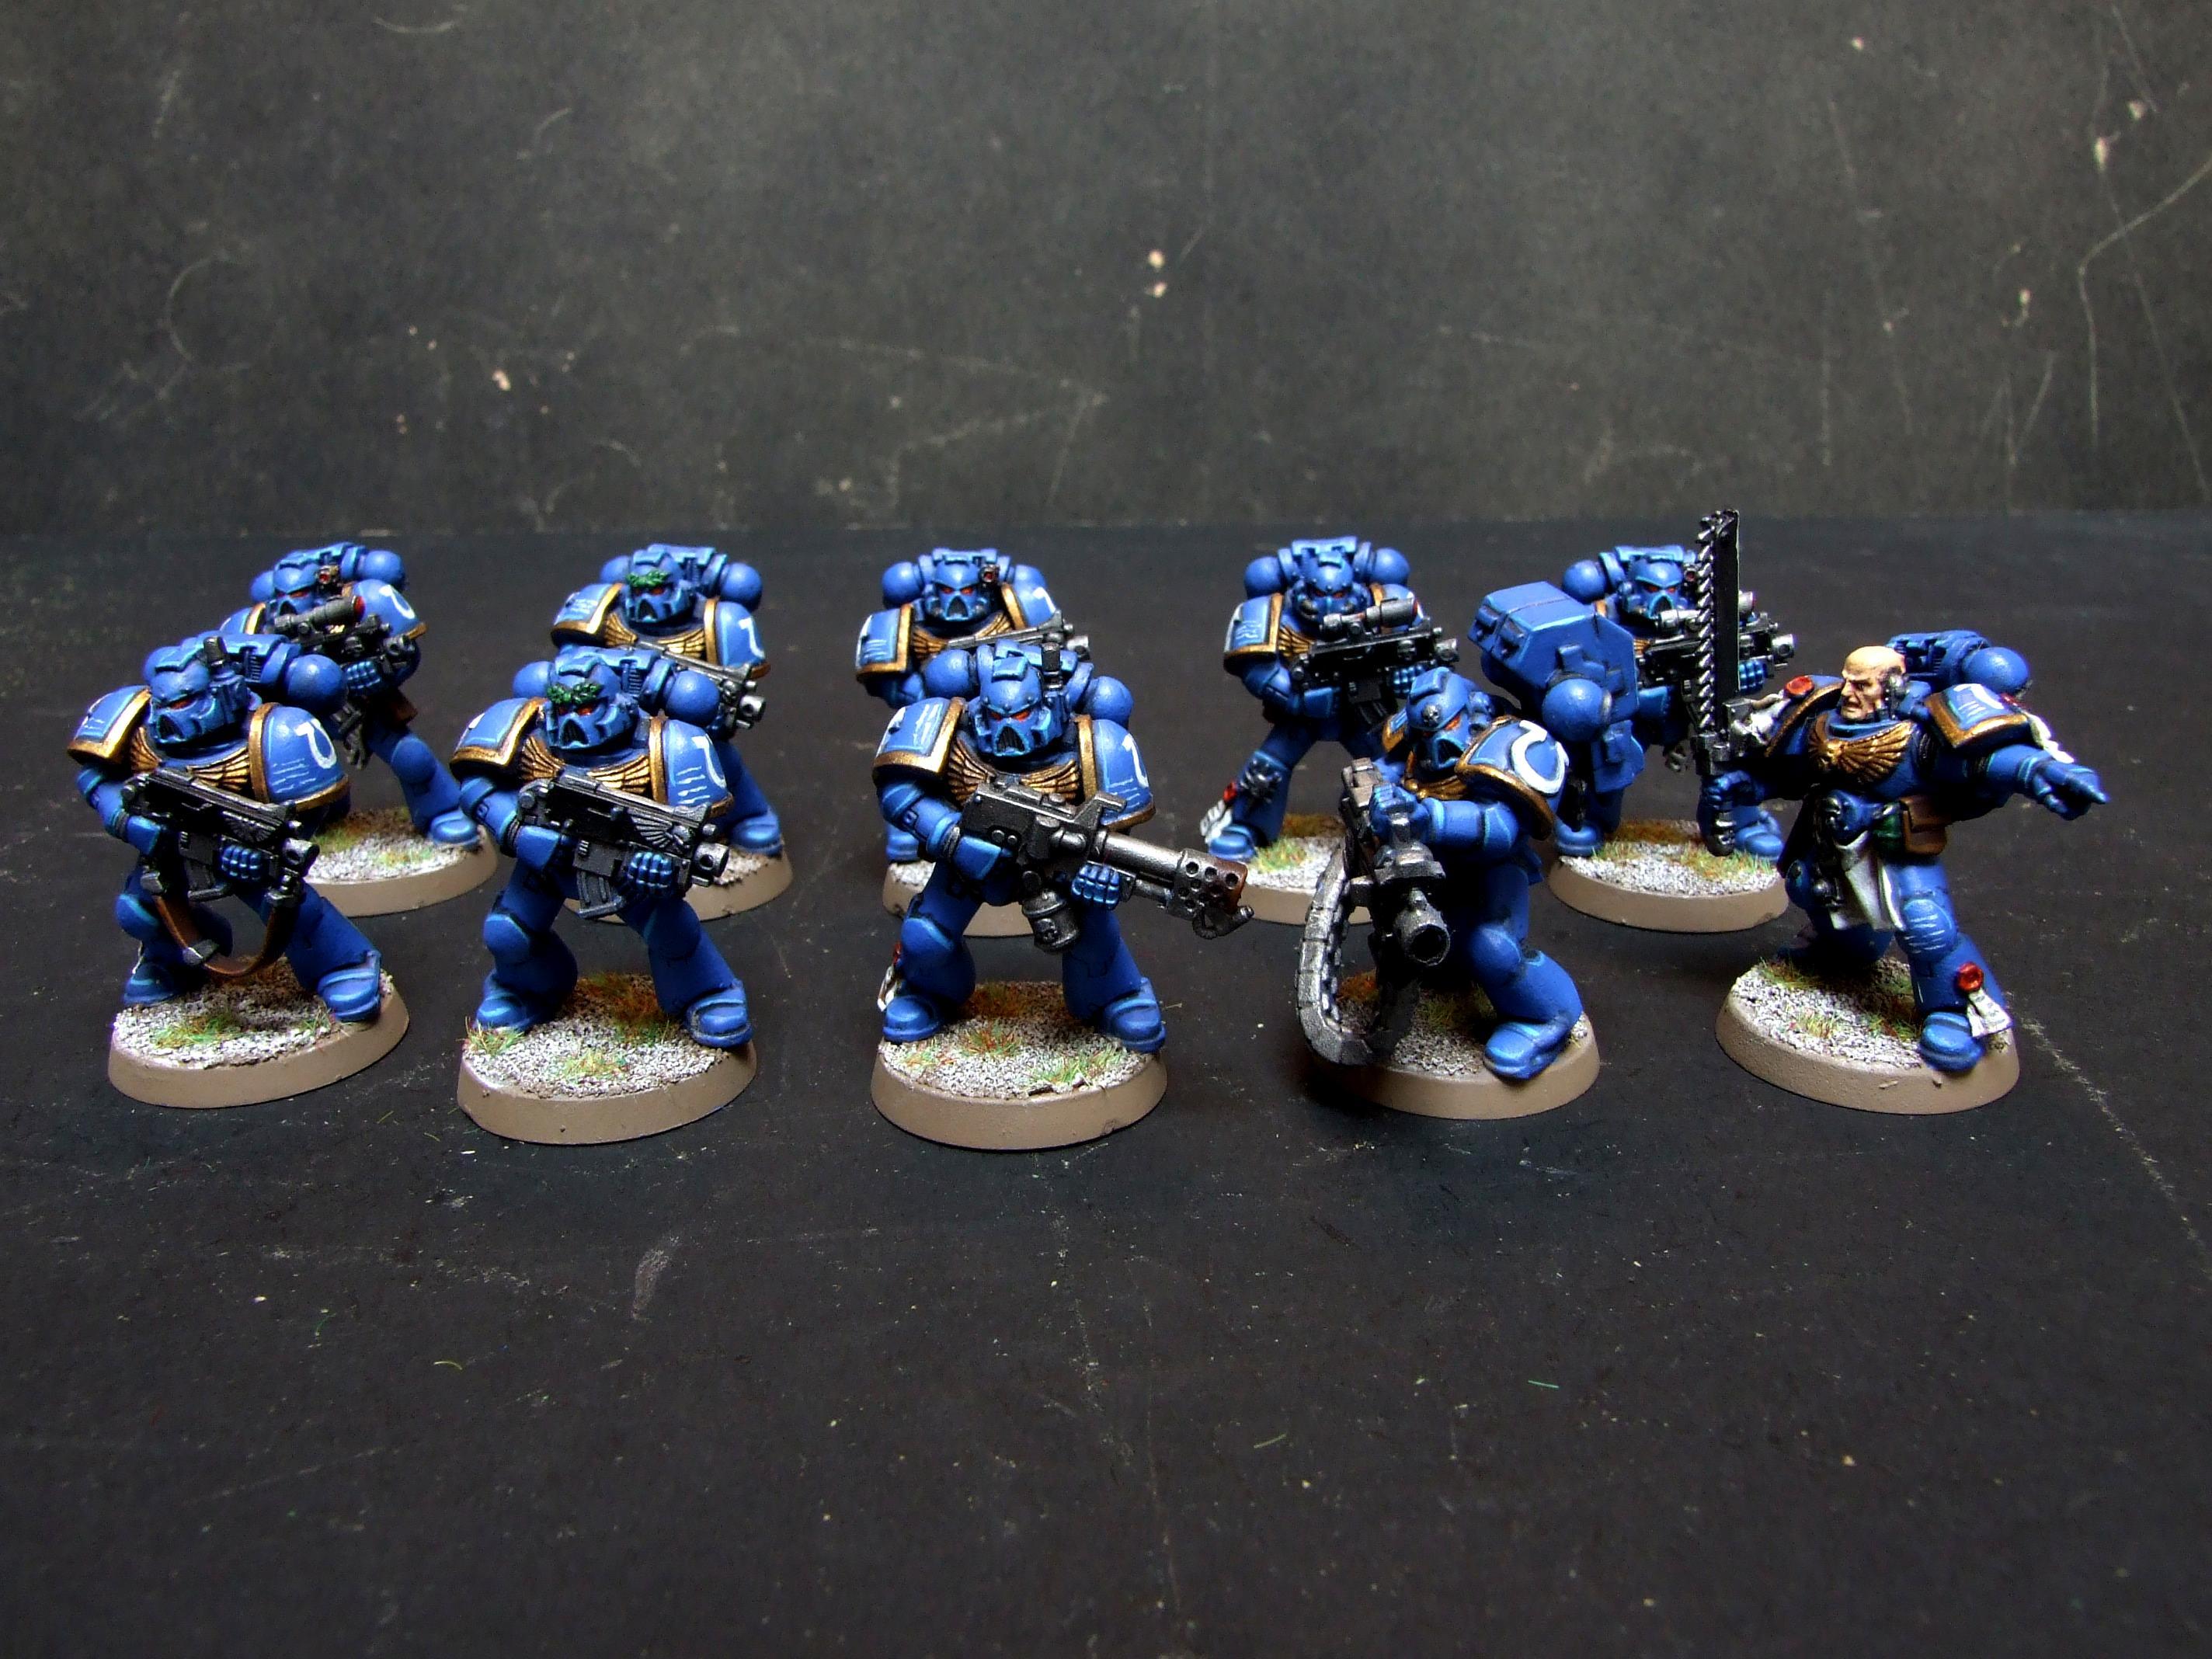 Assault On Black Reach, Blue, Flamer, Heavy Bolter, Imperial, Sergeant, Space Marines, Ultramarines, Warhammer 40,000